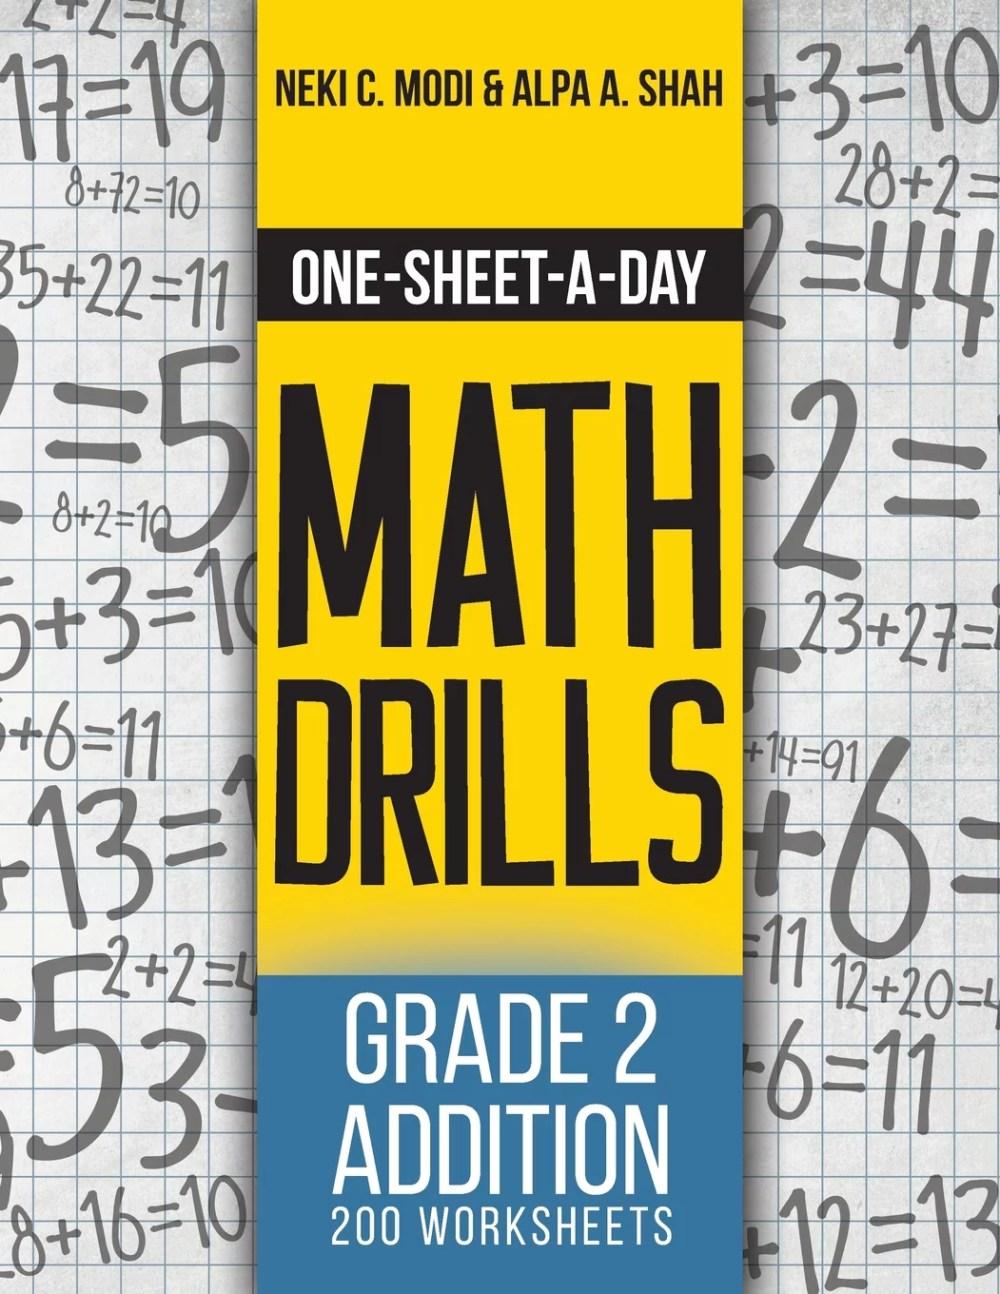 medium resolution of One-Sheet-A-Day Math Drills : Grade 2 Addition - 200 Worksheets (Book 3 of  24) - Walmart.com - Walmart.com